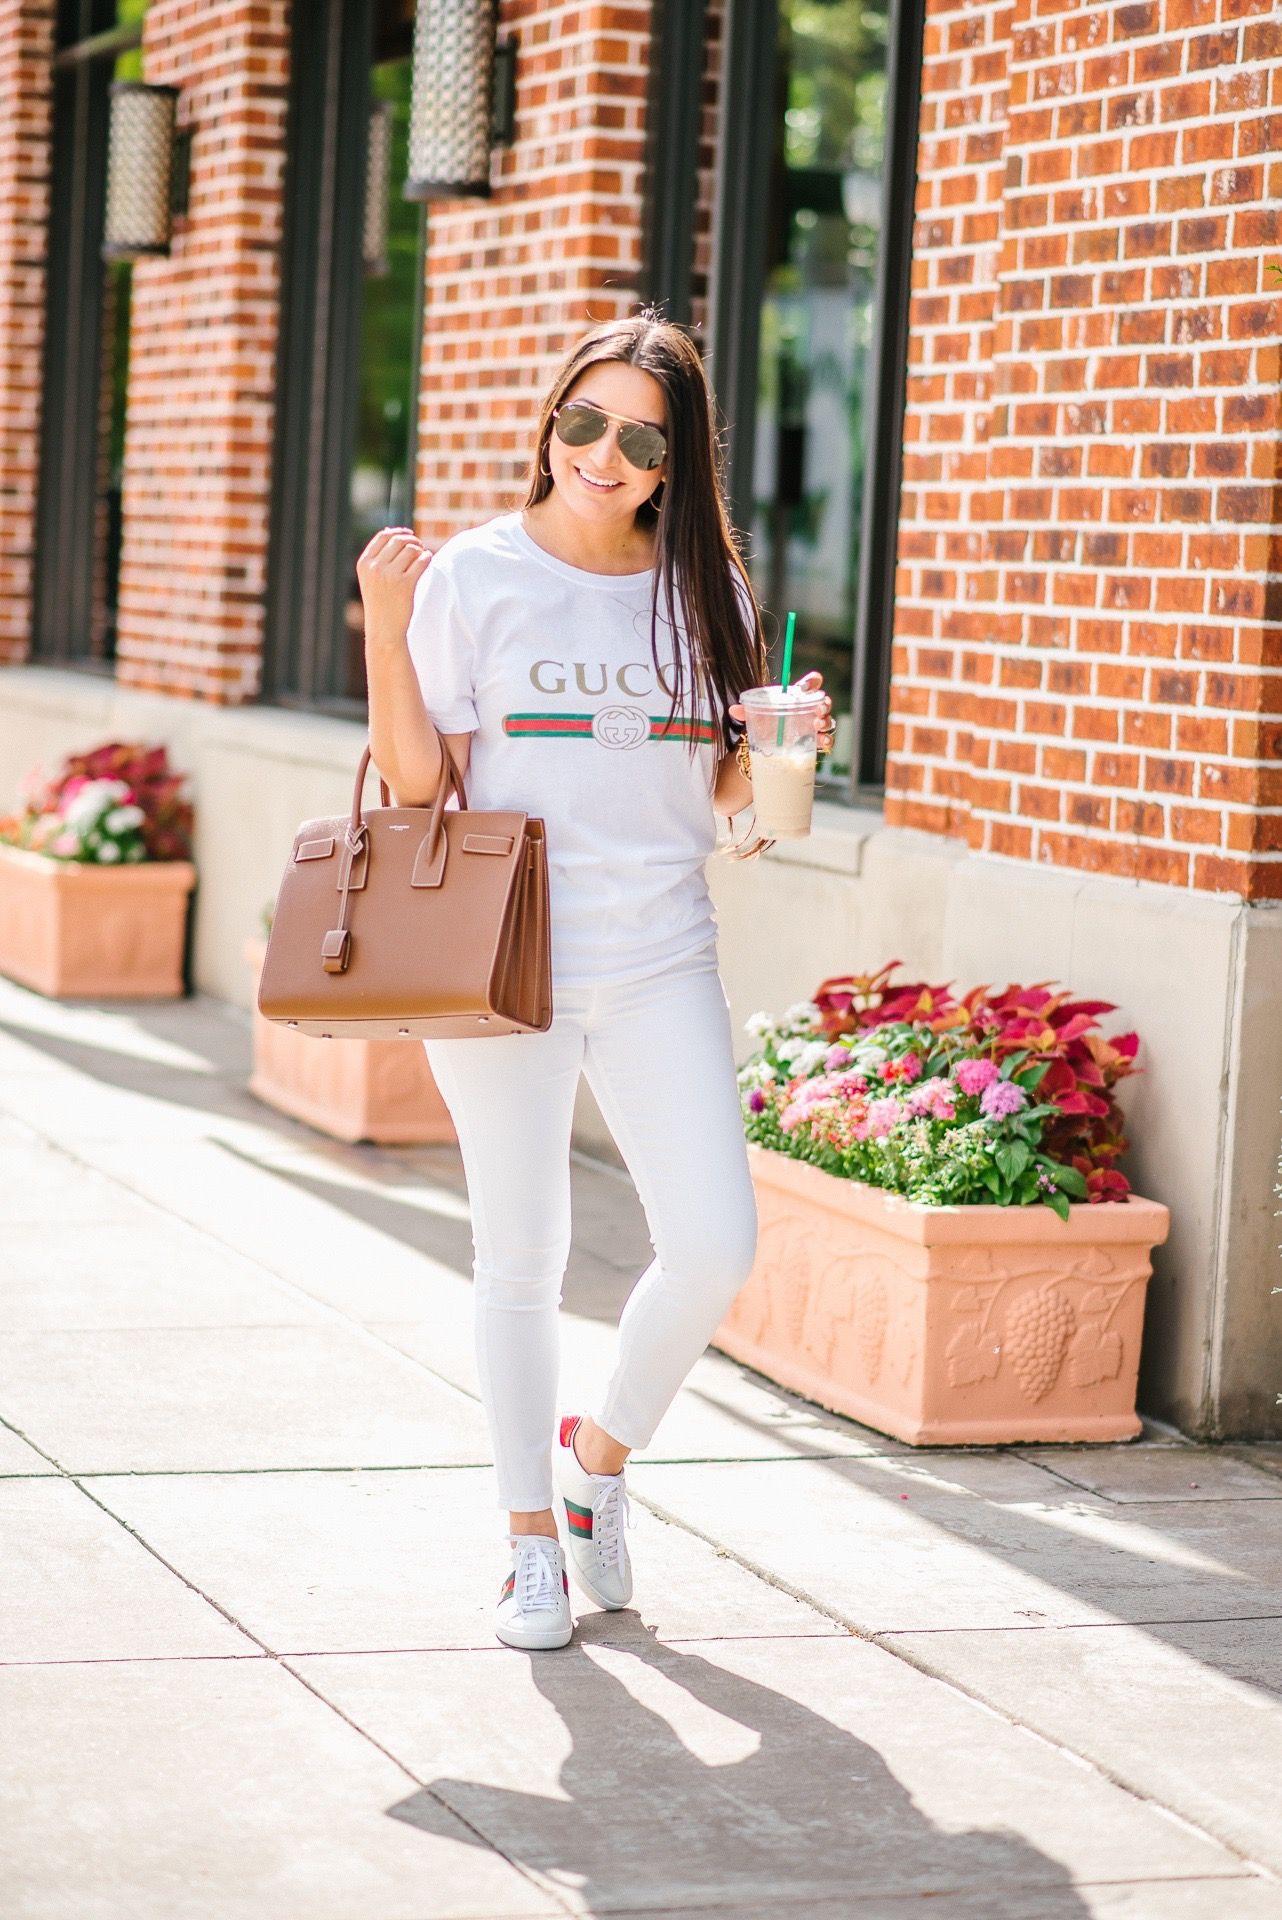 Gucci Tee + Gucci Sneakers | Tshirt